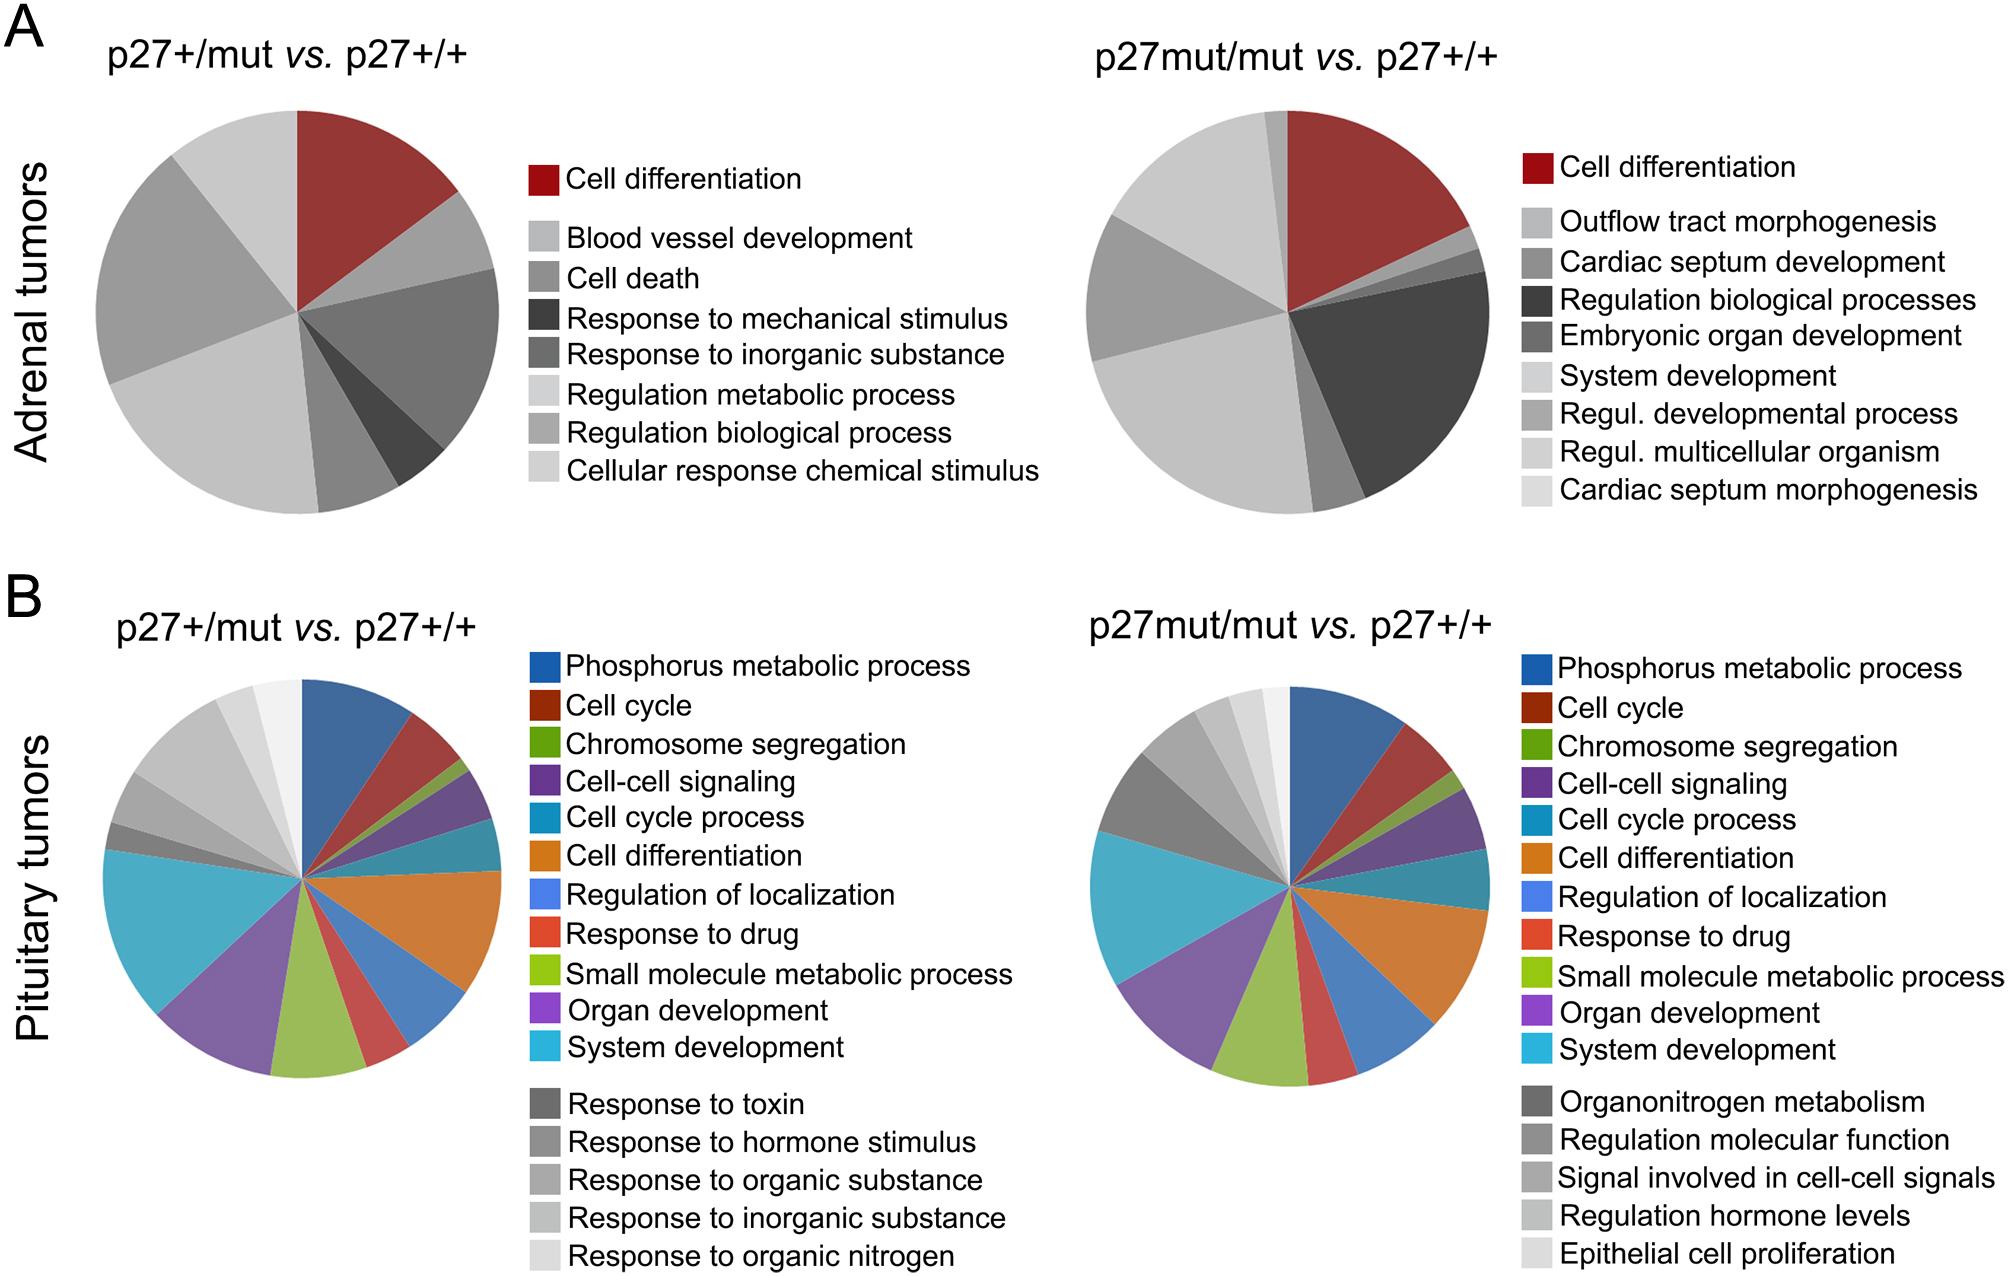 Characterization of neuroendocrine tumors in heterozygous